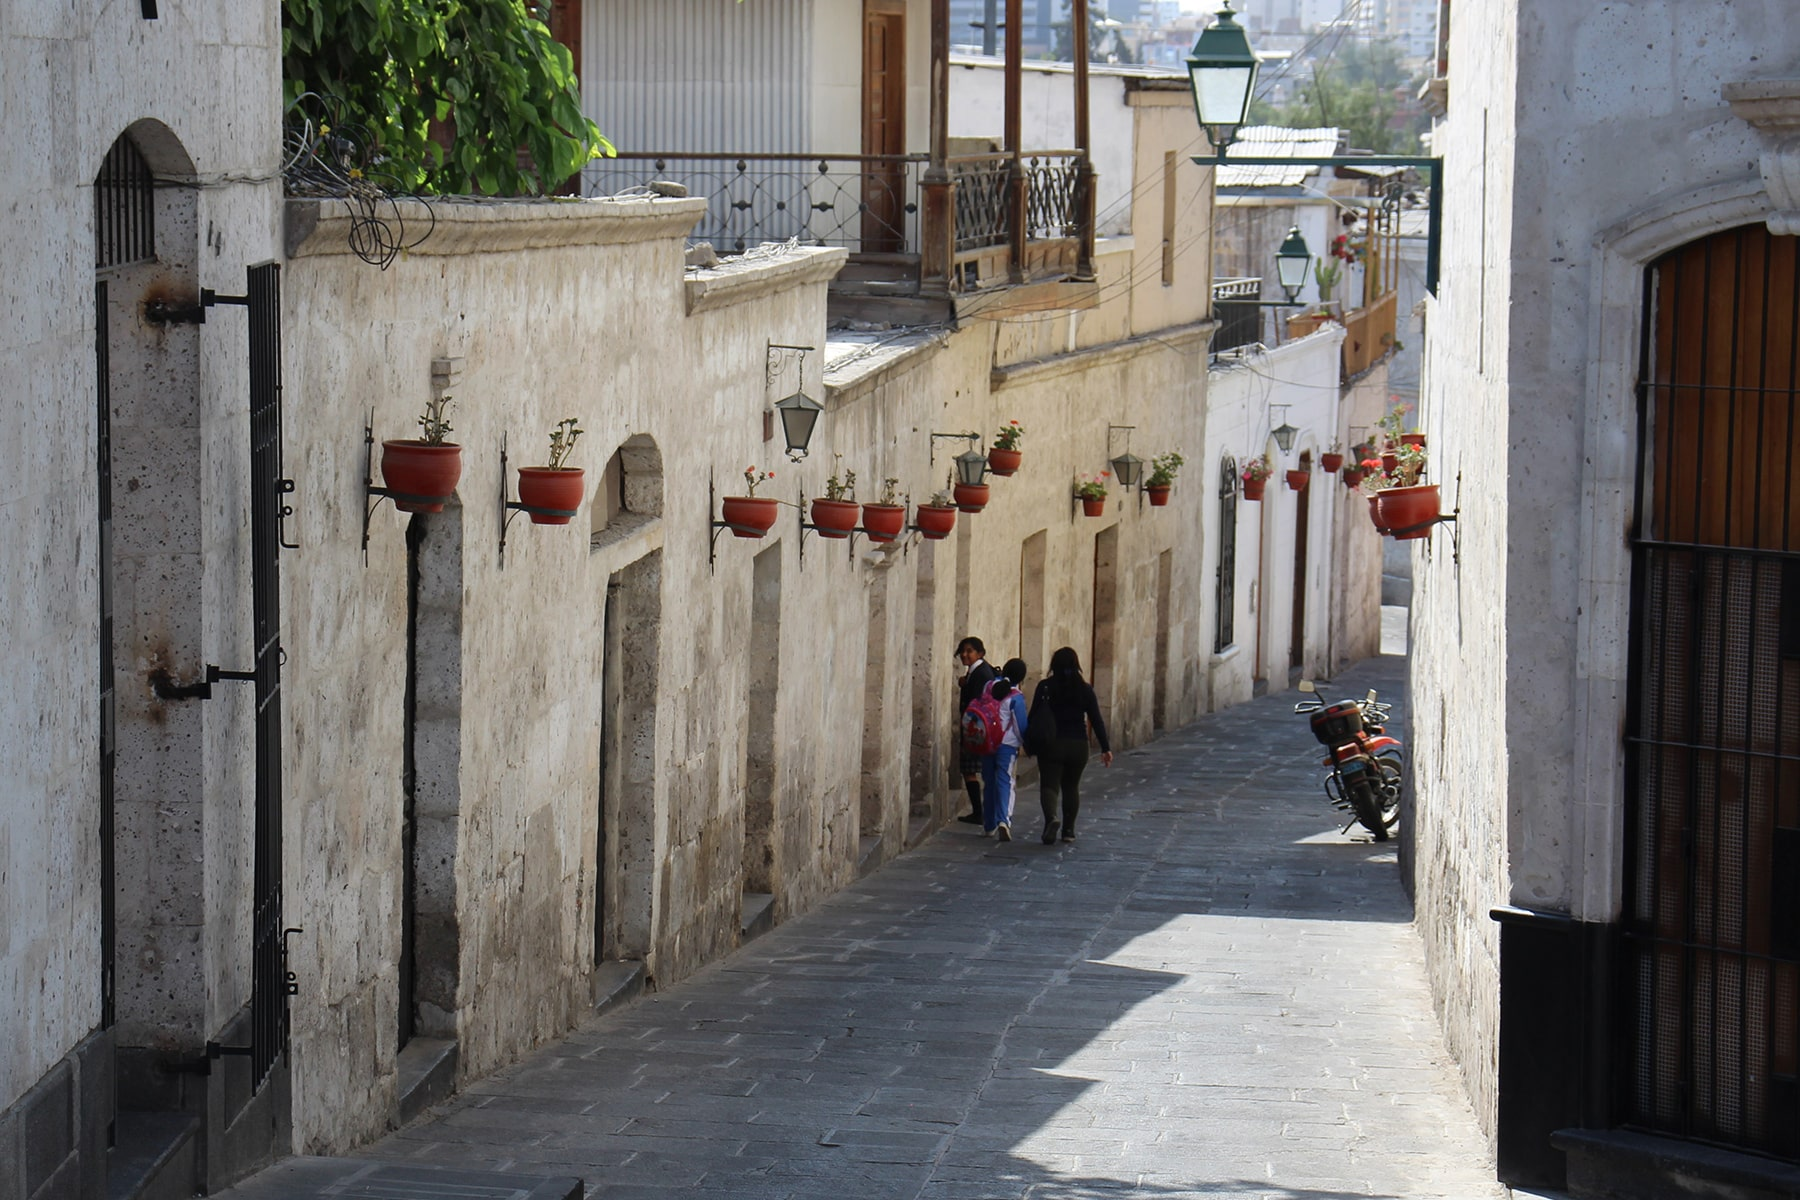 Strada del Quartiere del Callejón del Solar, Arequipa